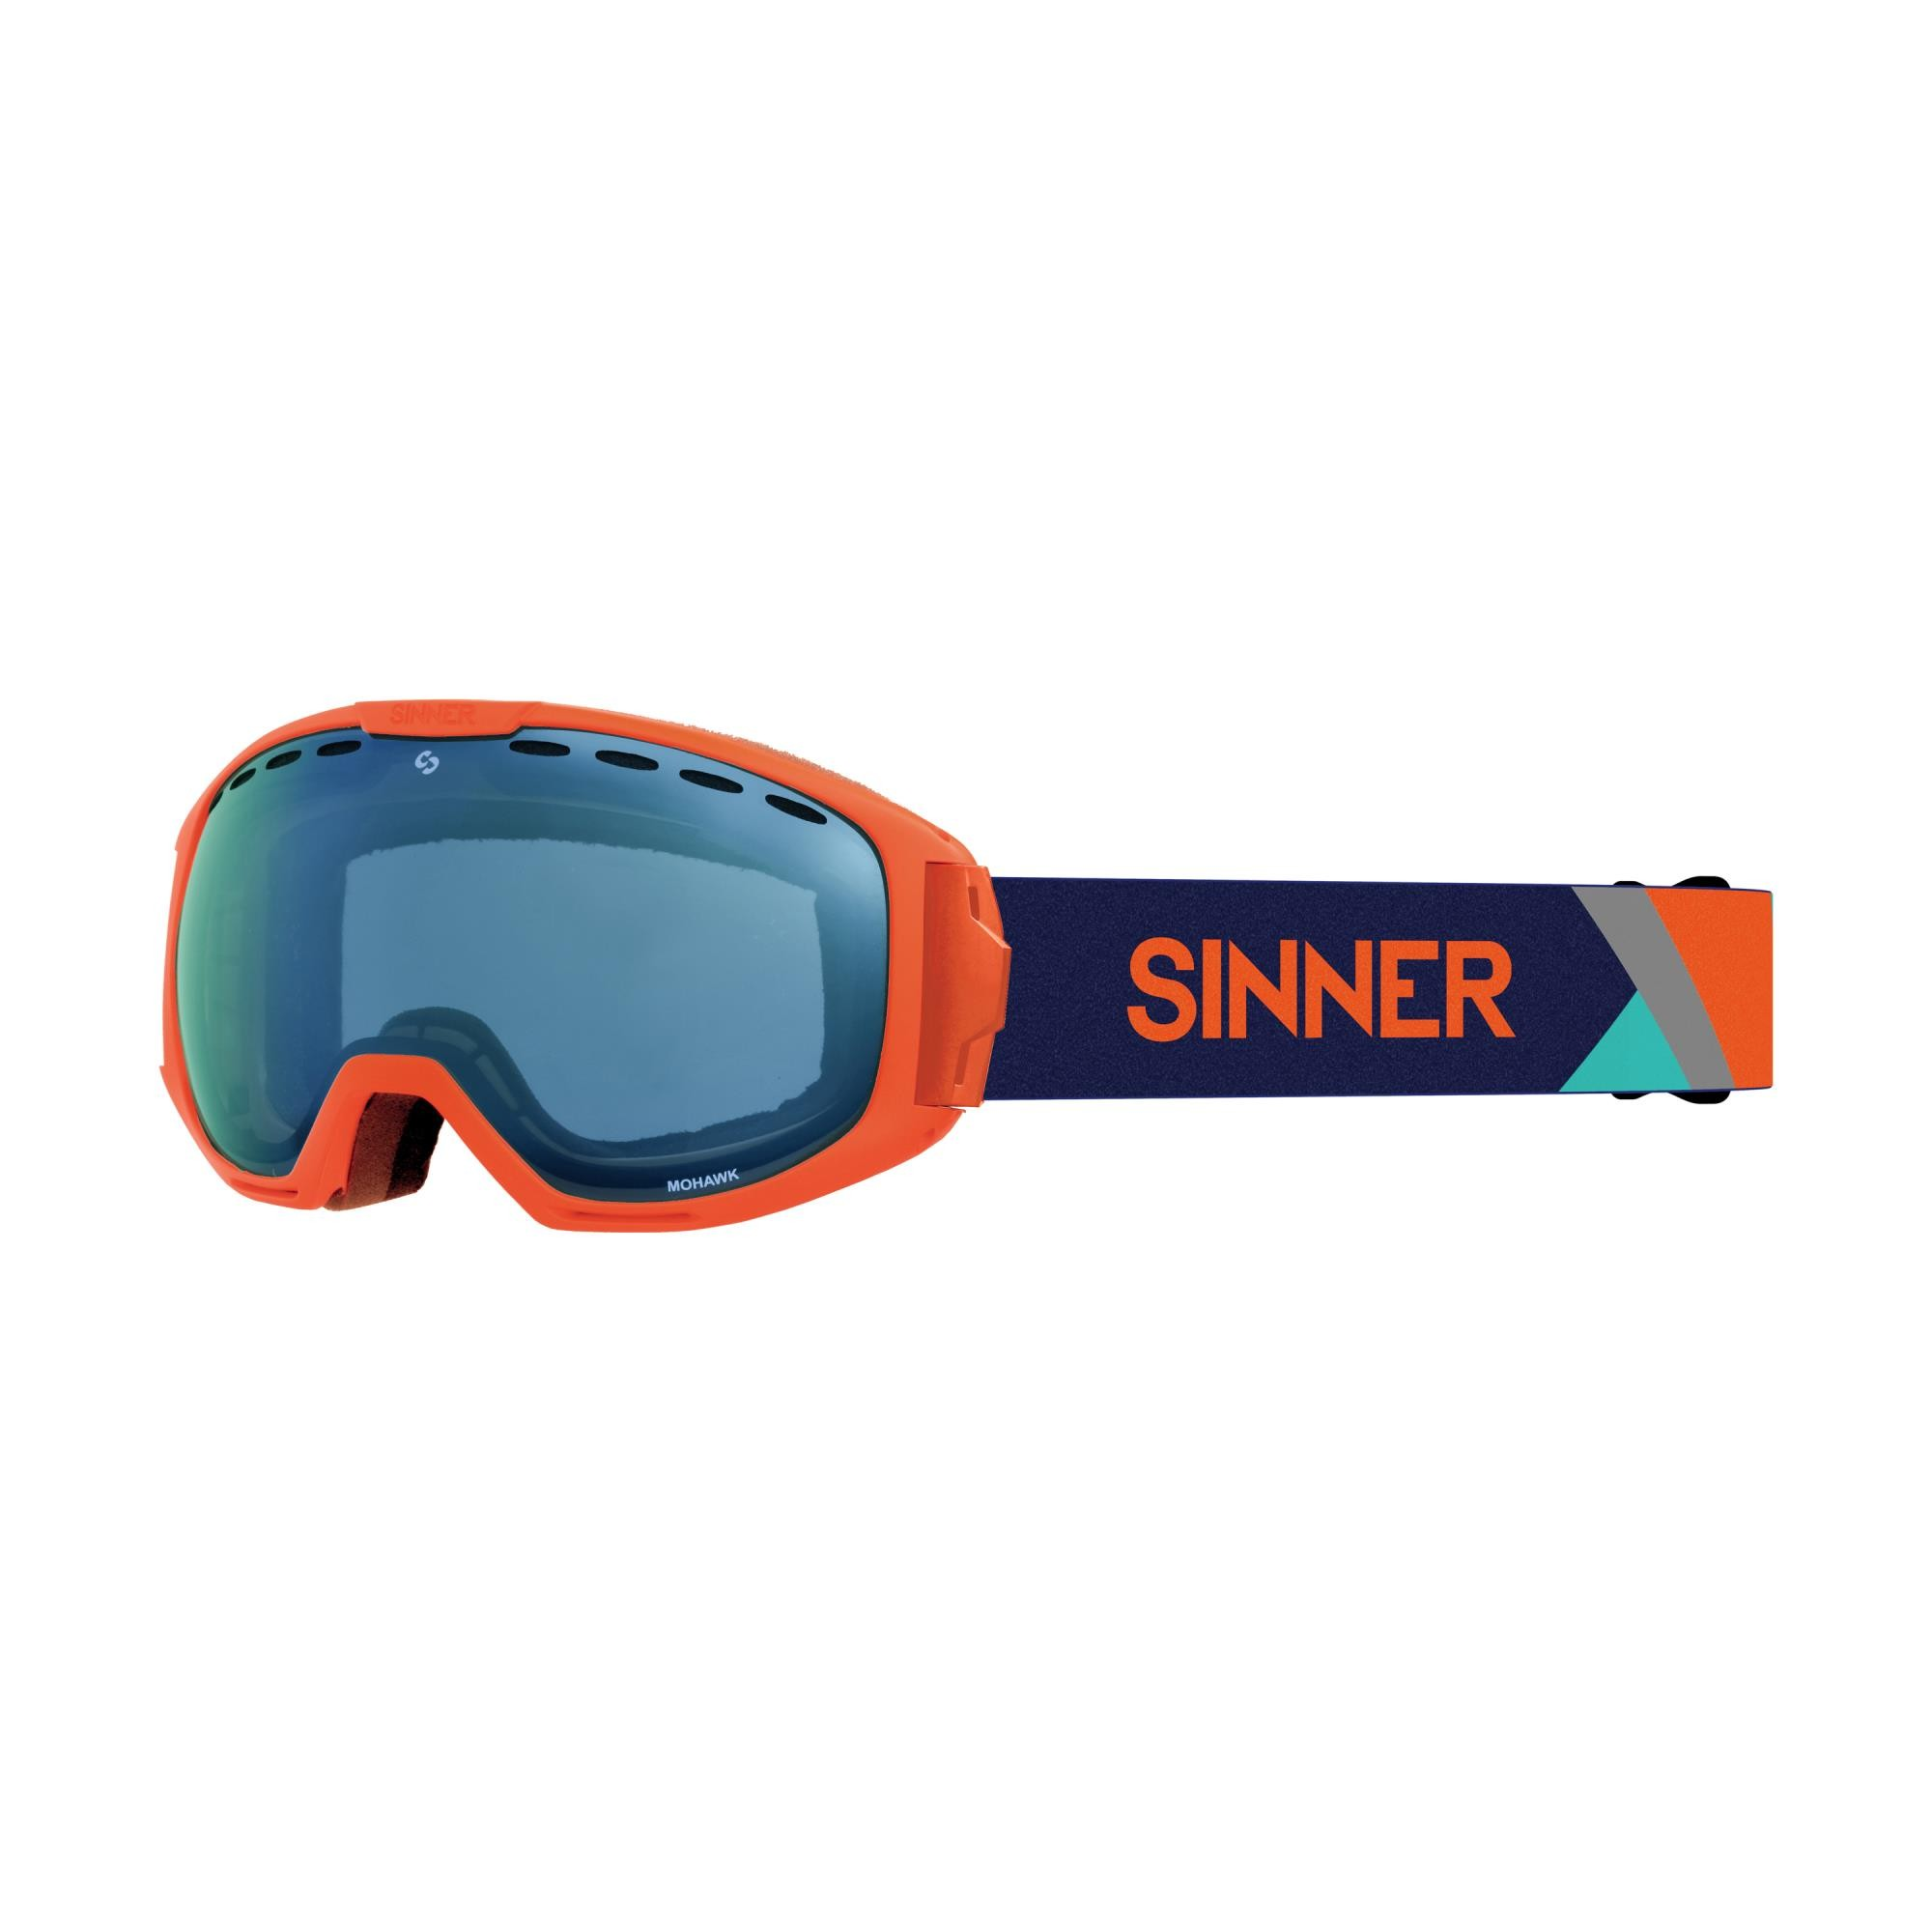 Sinner Mohawk Skibril - Oranje - Blauwe Spiegellens + Extra Roze Lens